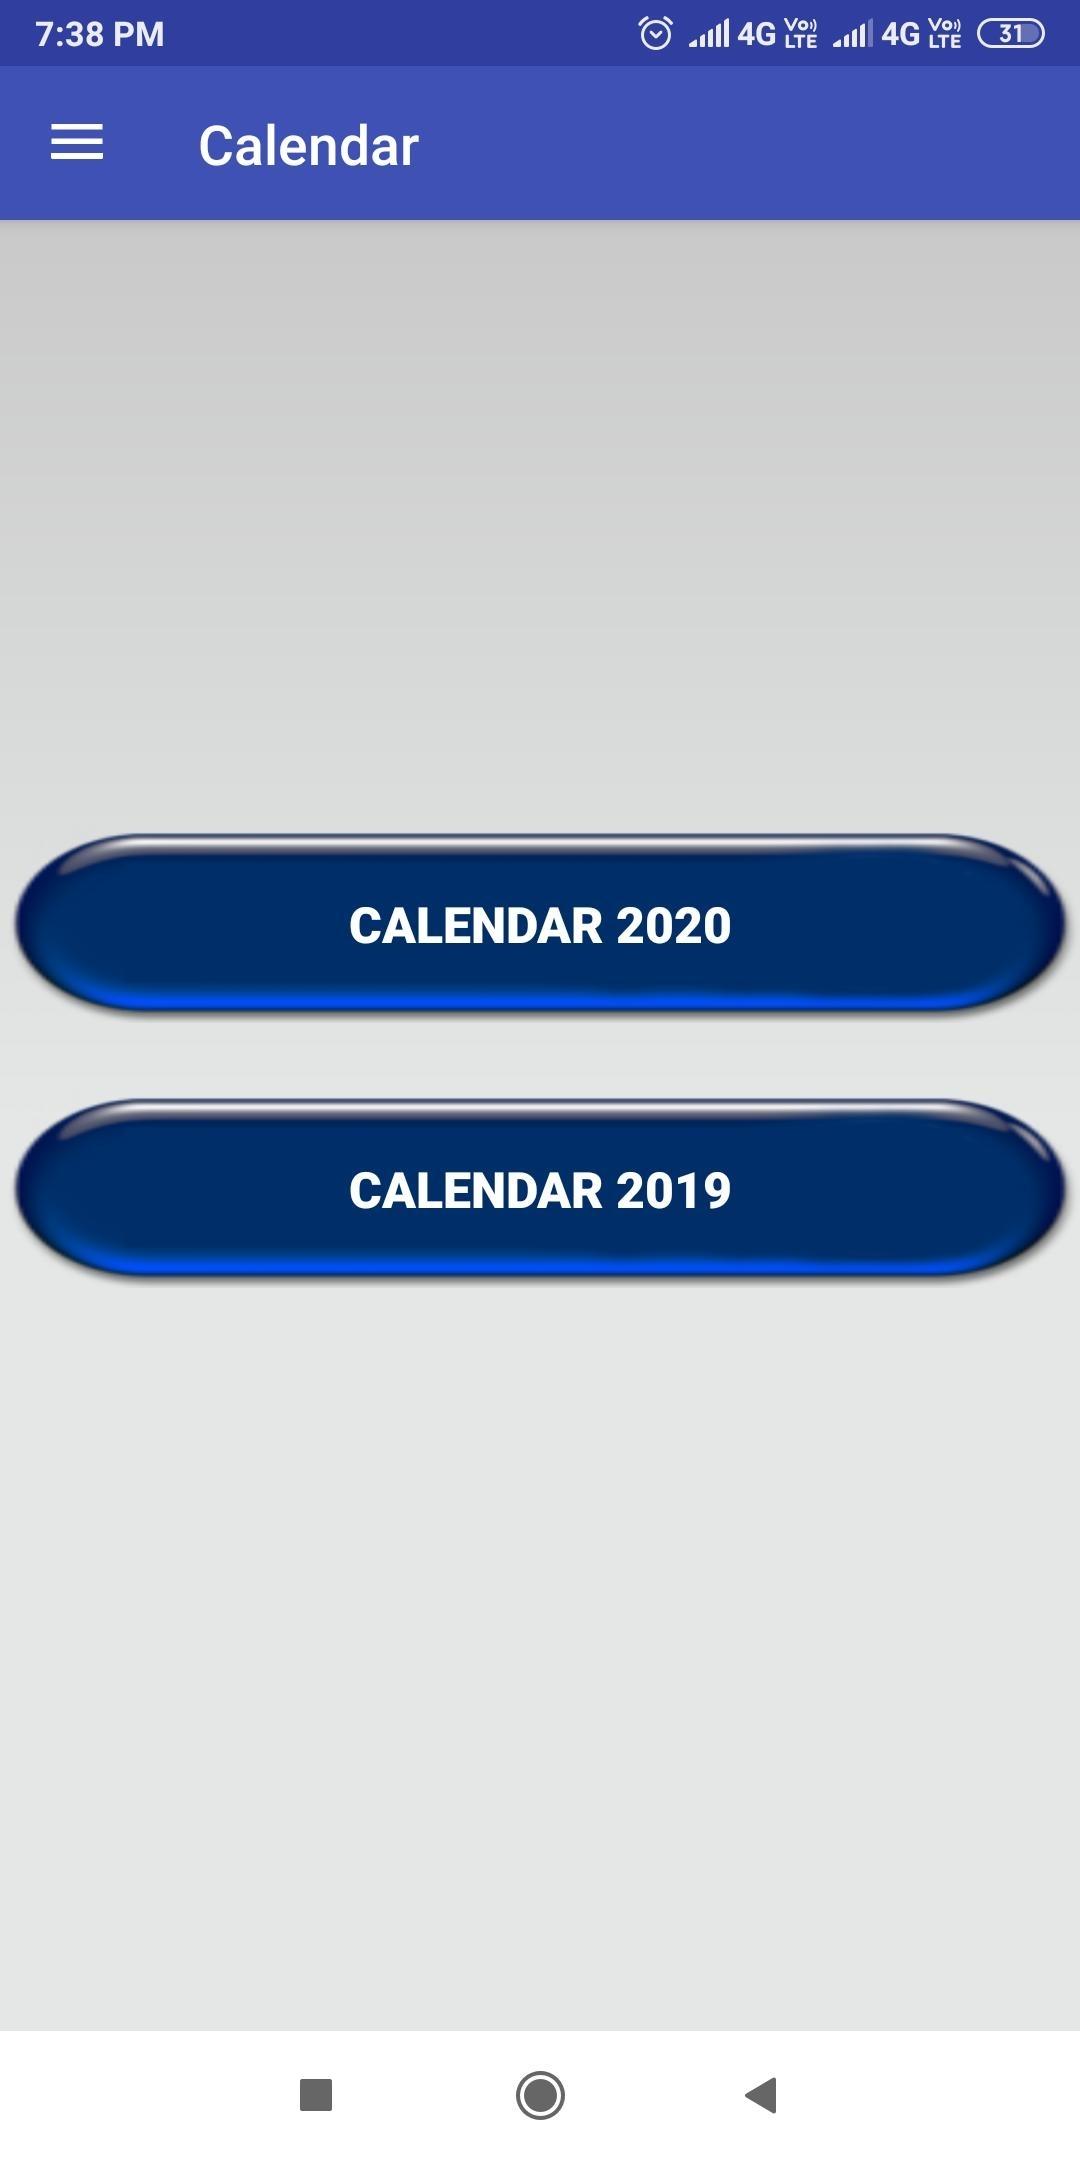 Gh Rh Calendar | Calendar | Foji/fauji Calendar For Android